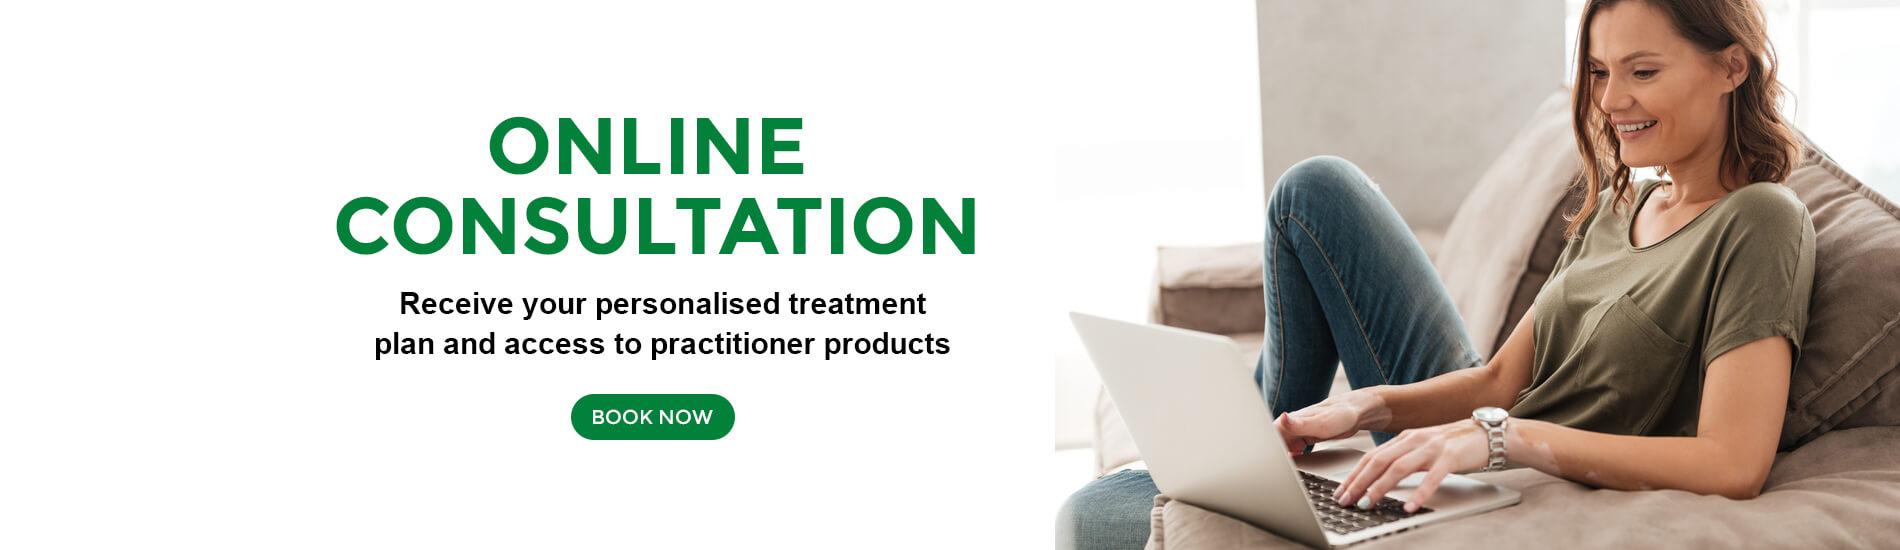 Online-Consultation-Banner